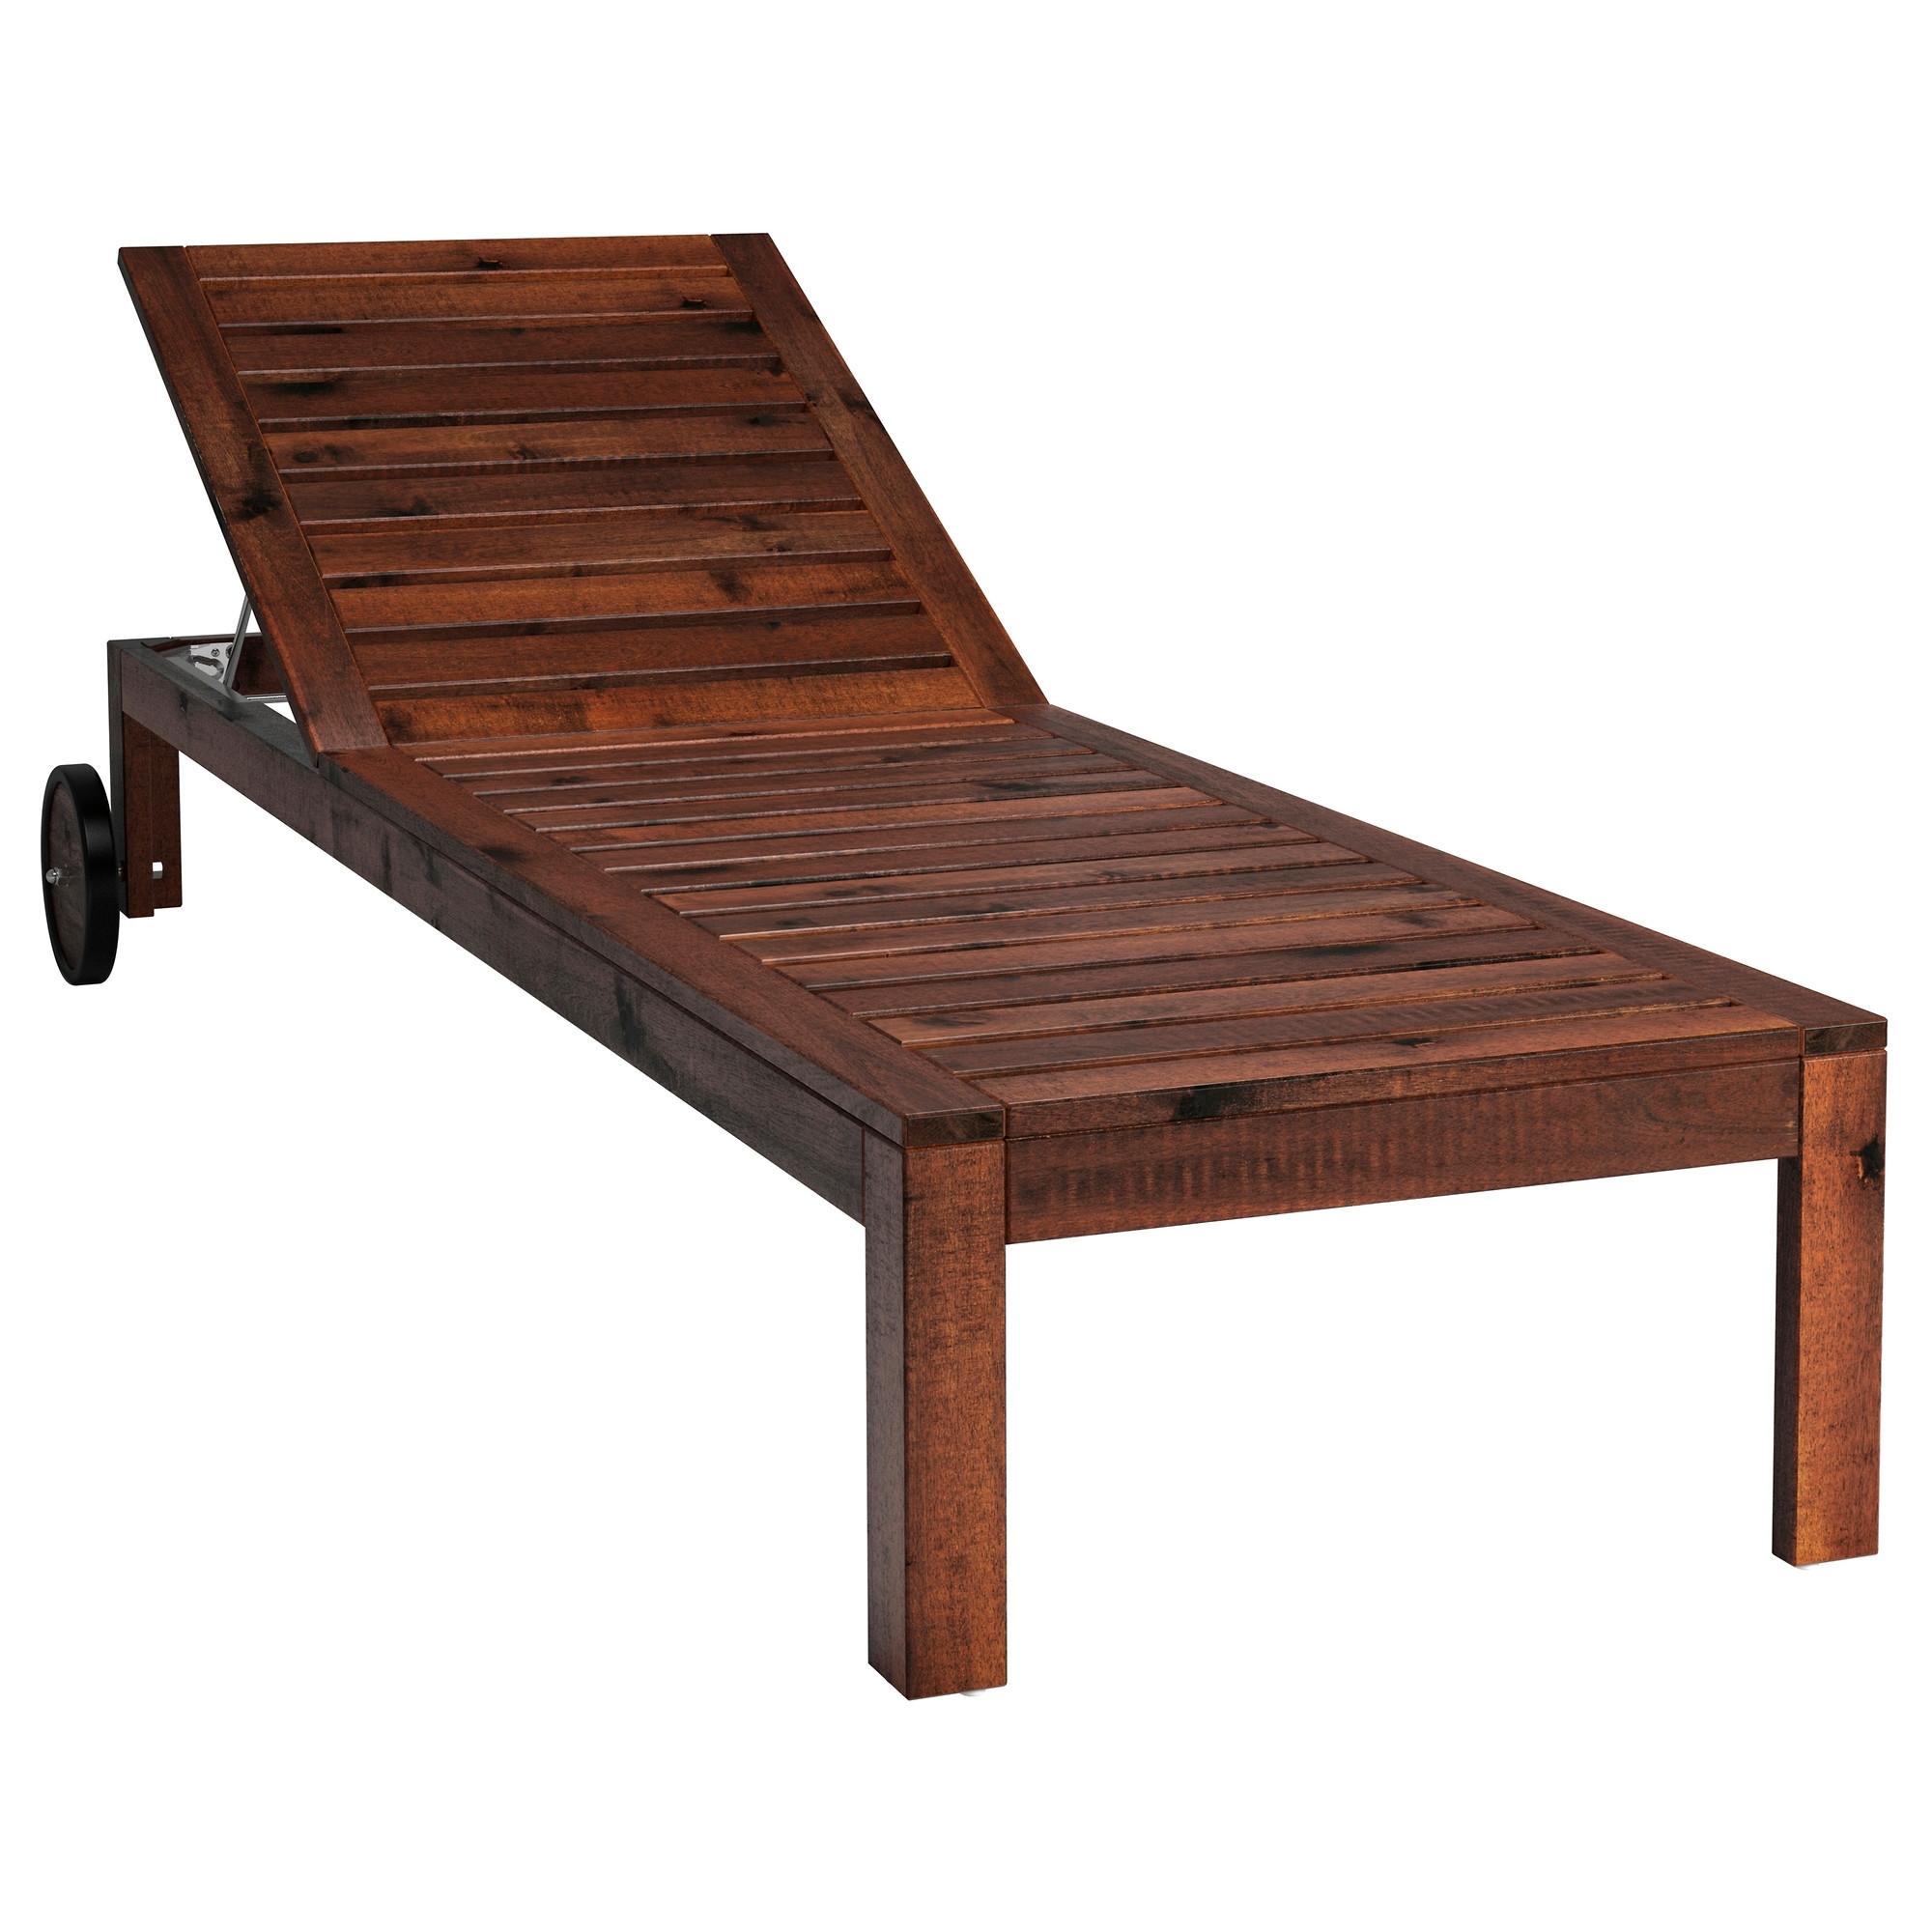 Äpplarö Chaise – Ikea Regarding Newest Ikea Chaise Lounge Chairs (View 14 of 15)